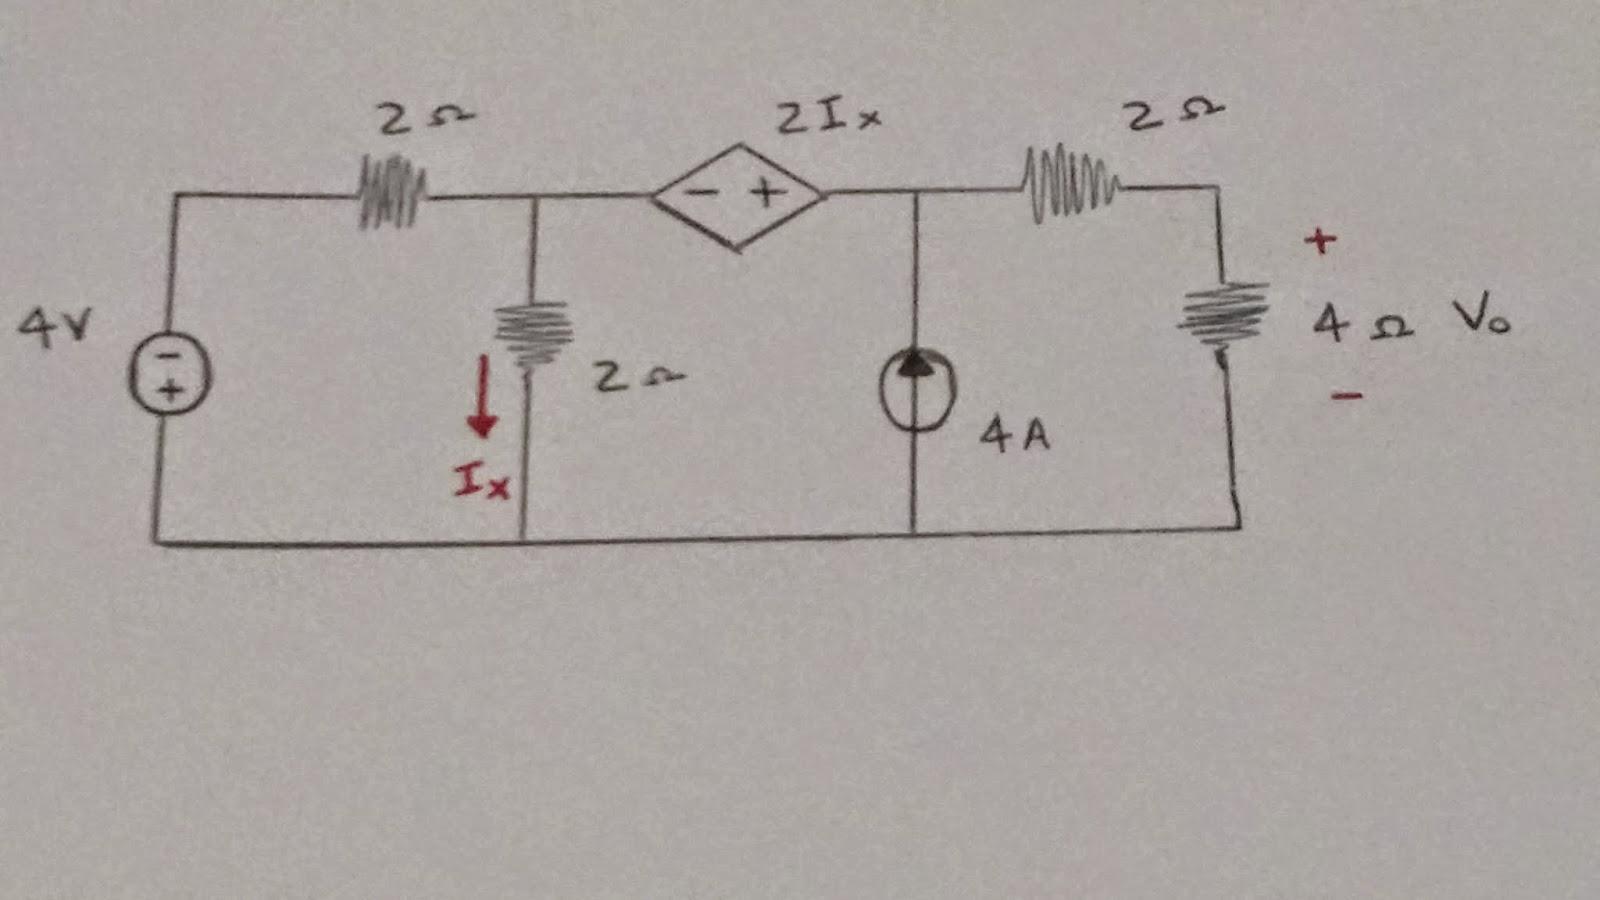 Circuito Eletricos : Exercício de circuitos elétricos fonte de corrente aluno de